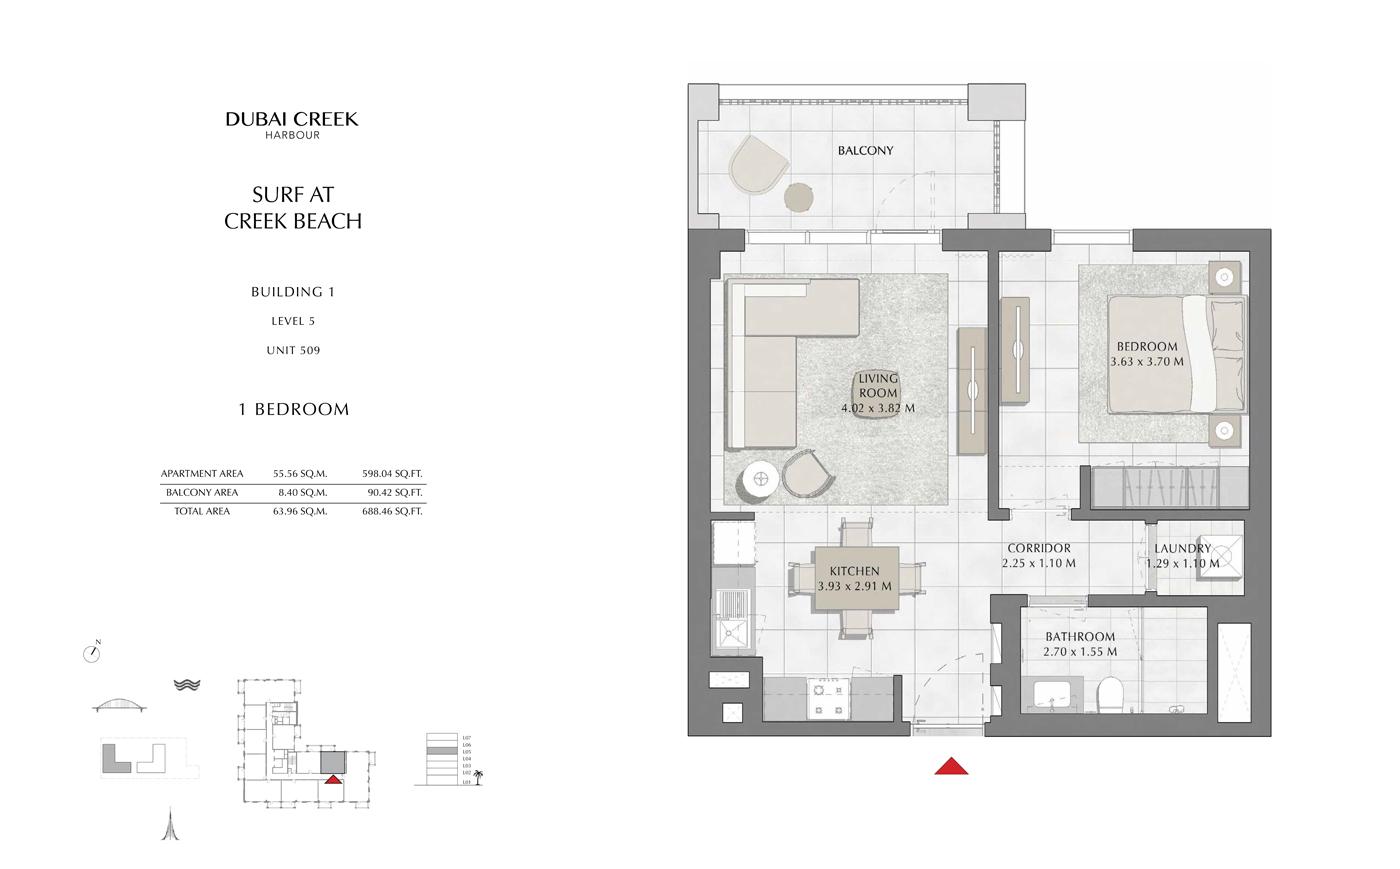 Building 1, 1 Bedroom, Level 5, Size 688 Sq Ft